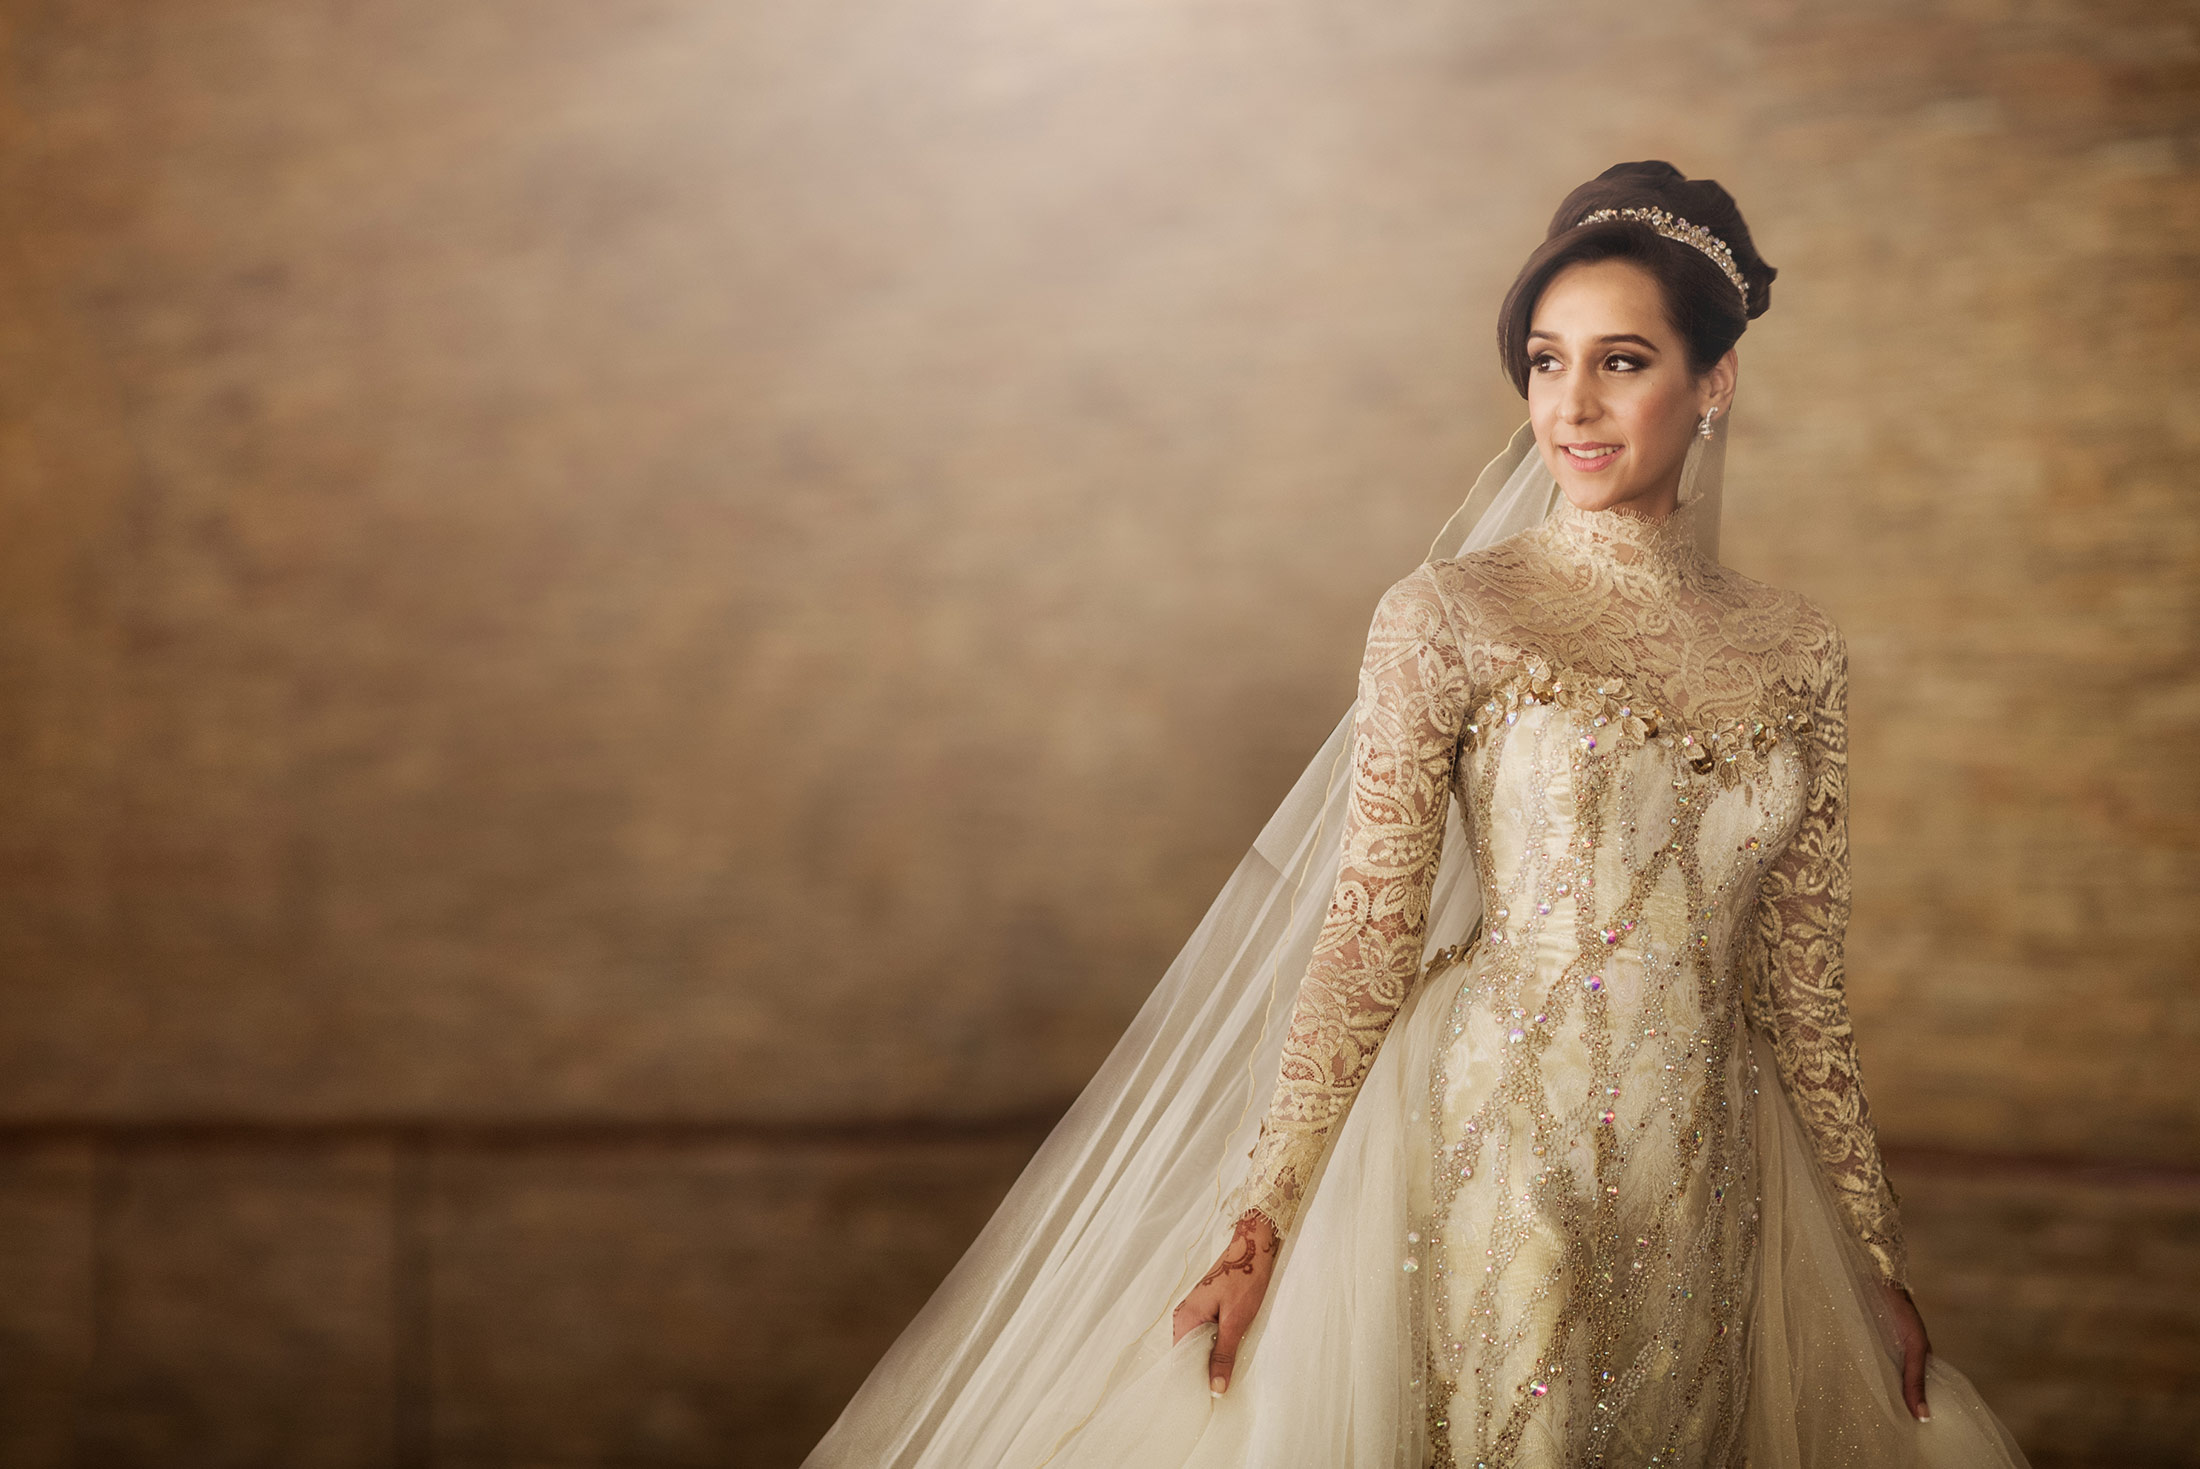 Muslim wedding photographers